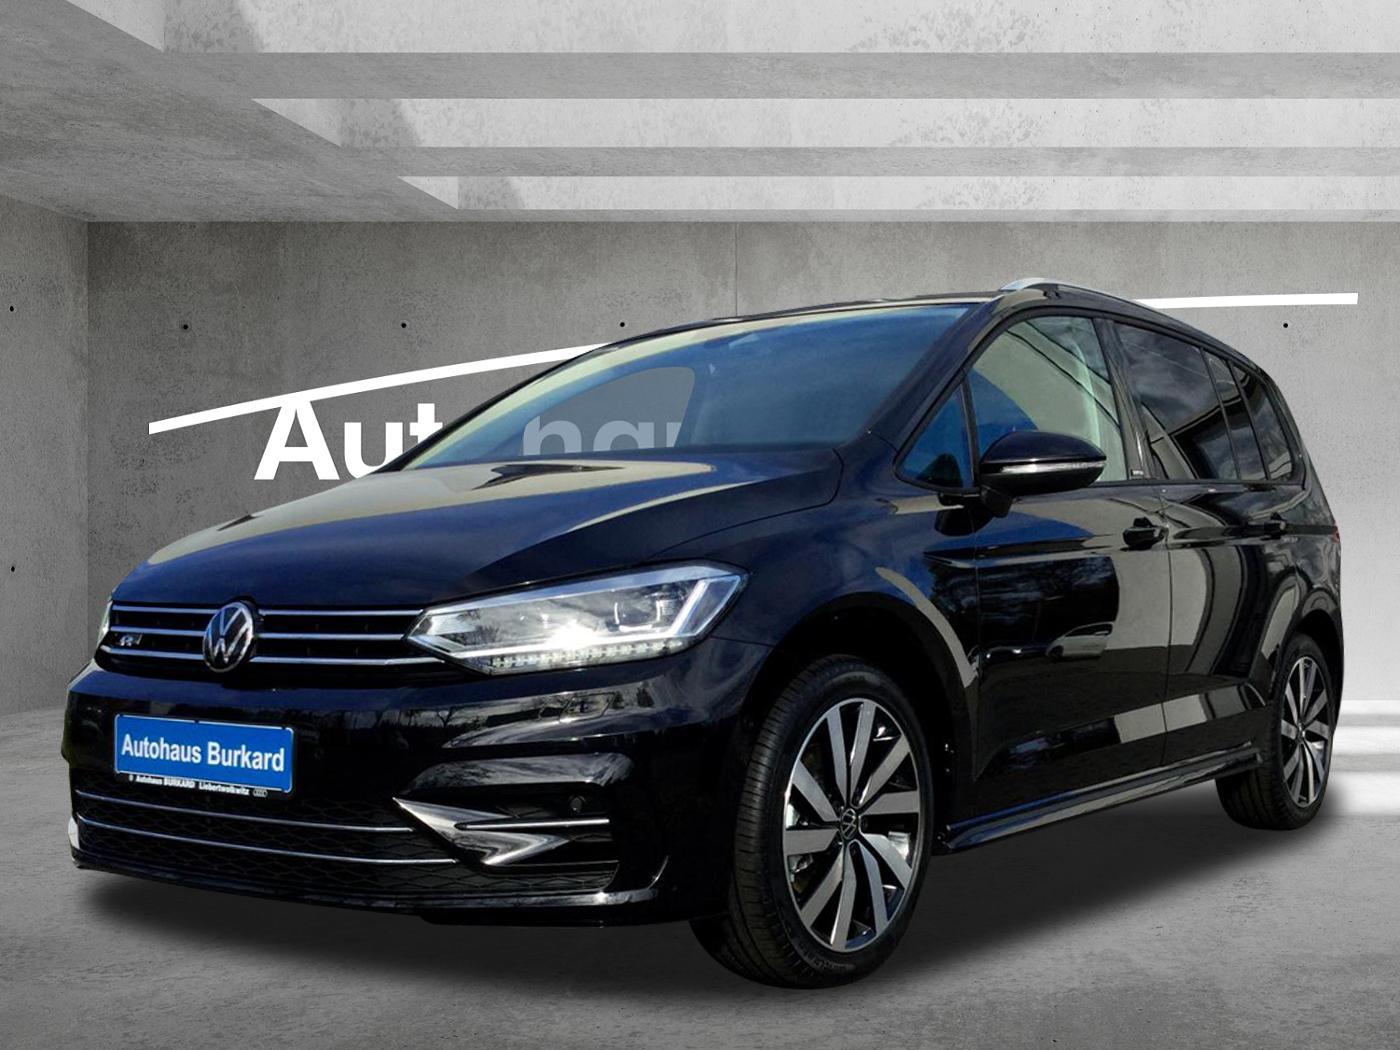 Volkswagen Touran UNITED 1,5 l TSI 150 PS 7-Gang DSG R-line, Jahr 2021, Benzin